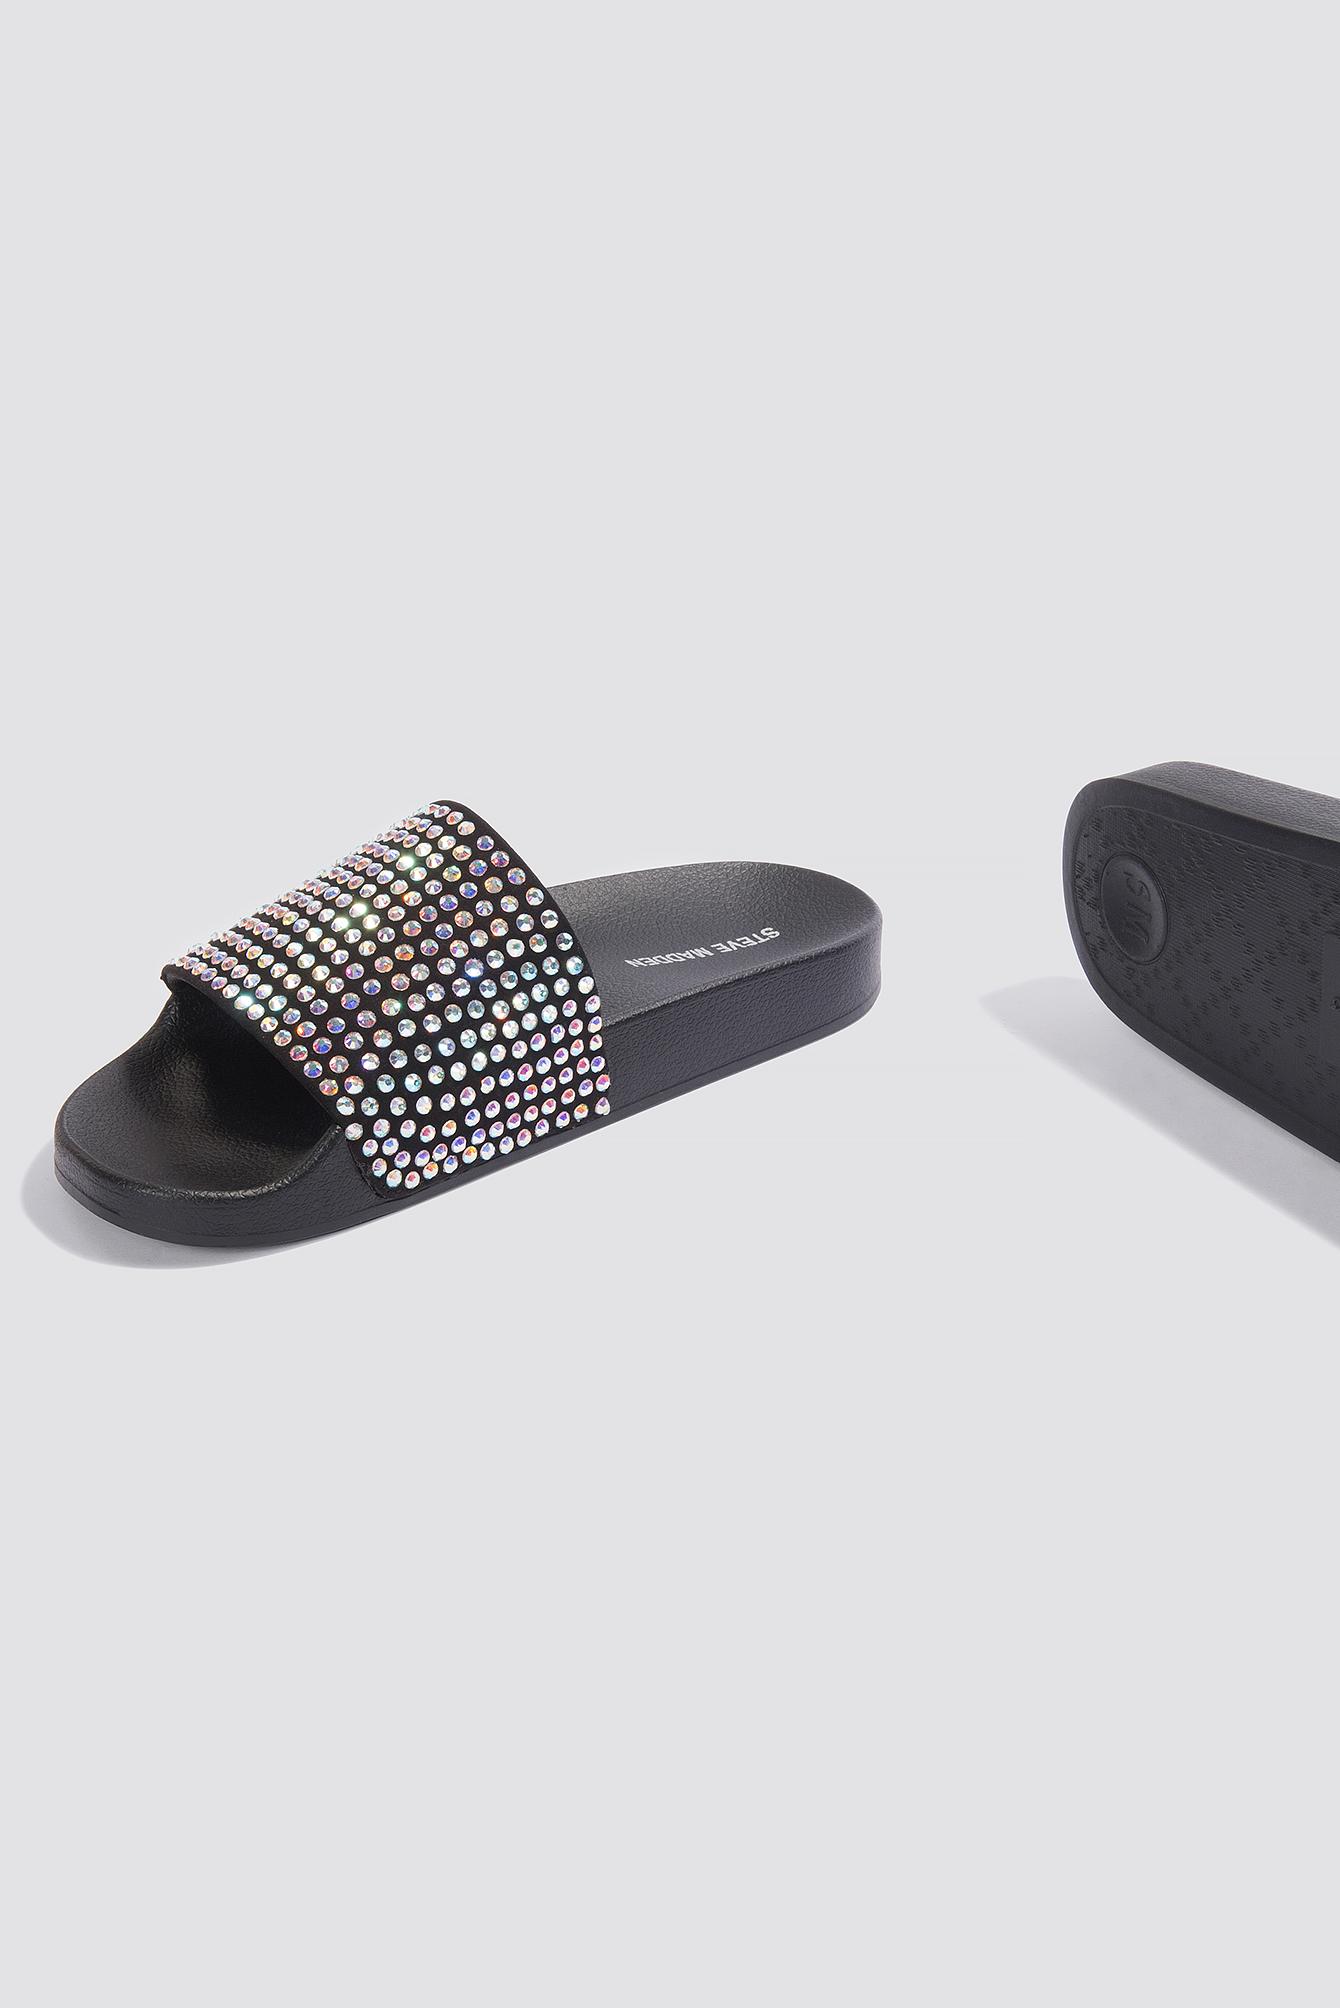 eda615b06 Steve Madden Softey-R Slipper Sandals Metallic